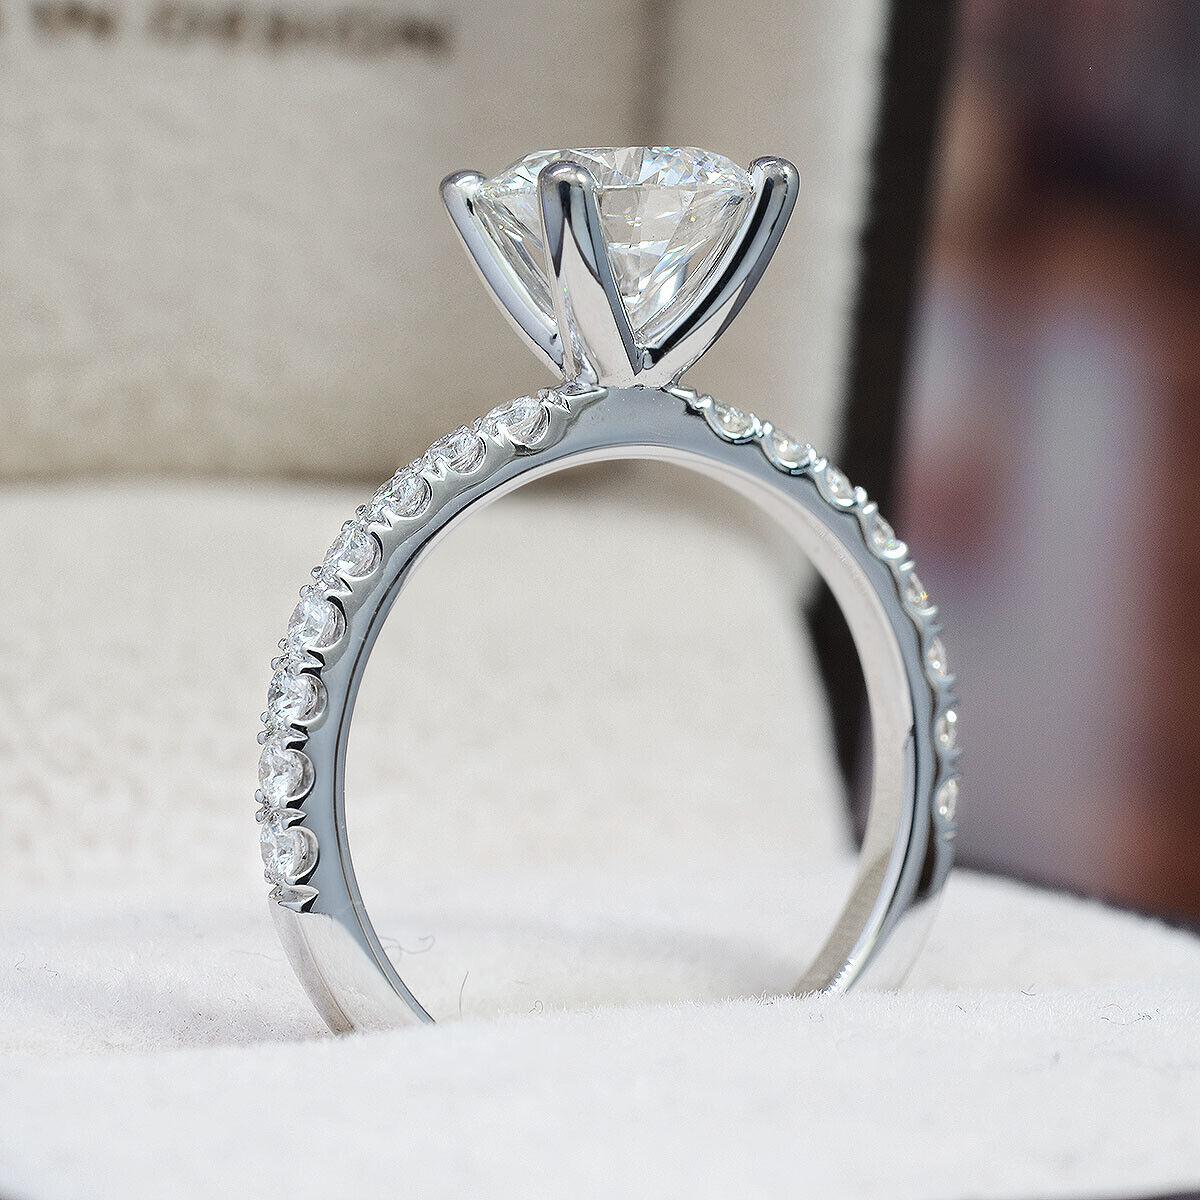 1.57 TCW Natural Round Cut U-Pave Diamond Engagement Ring - G-SI1 Triple X GIA  2